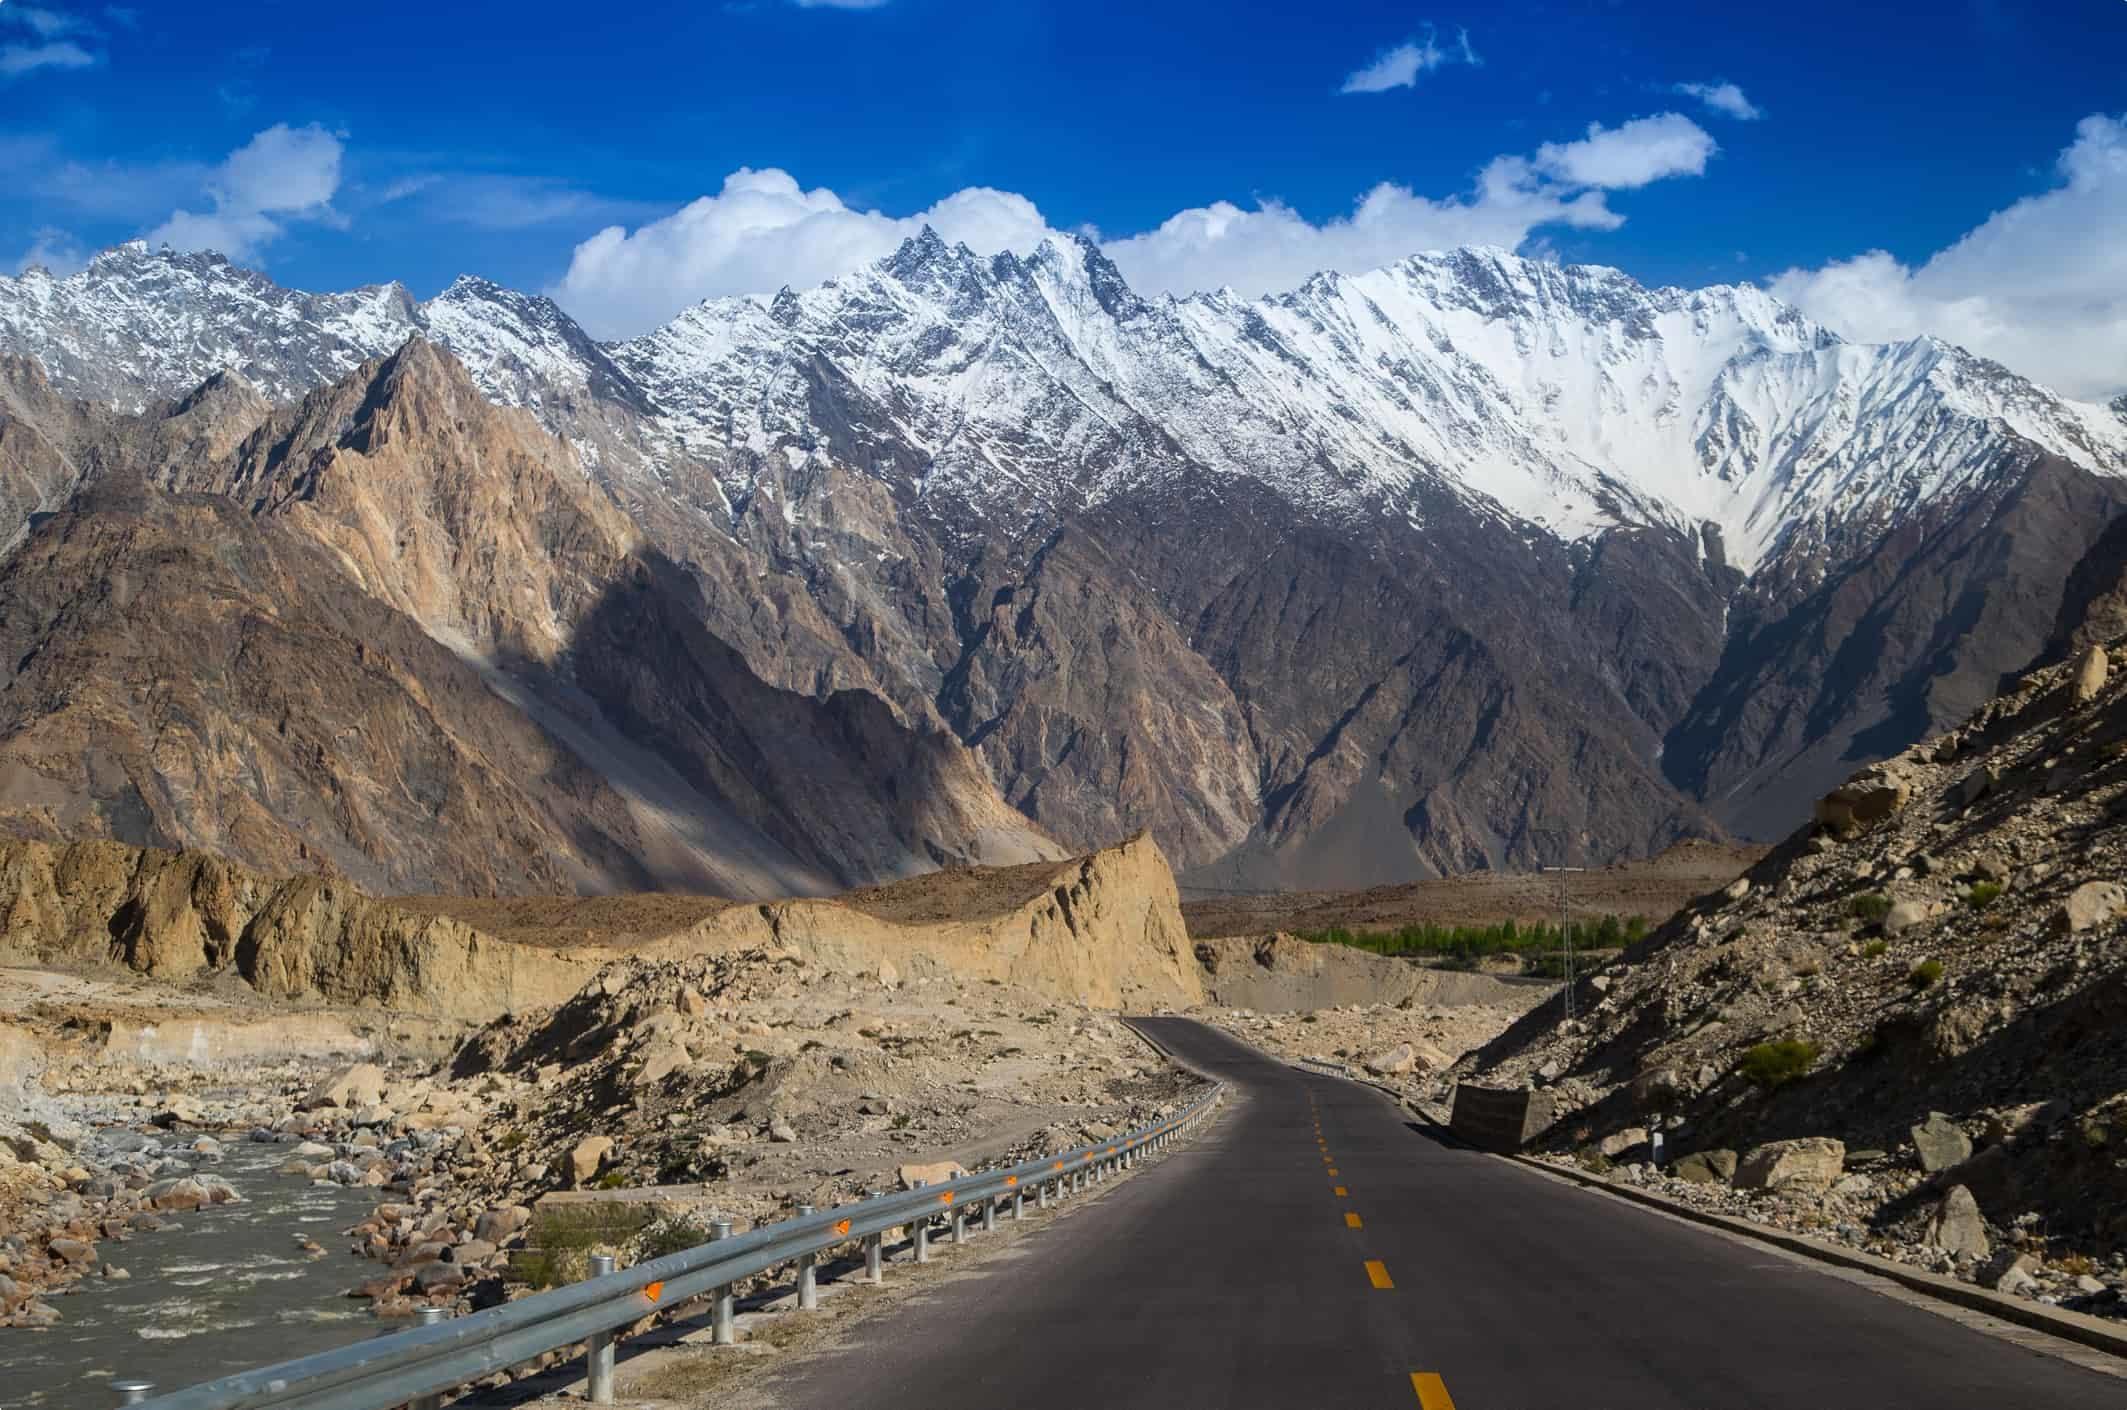 Karakoram Highway with mountain in background